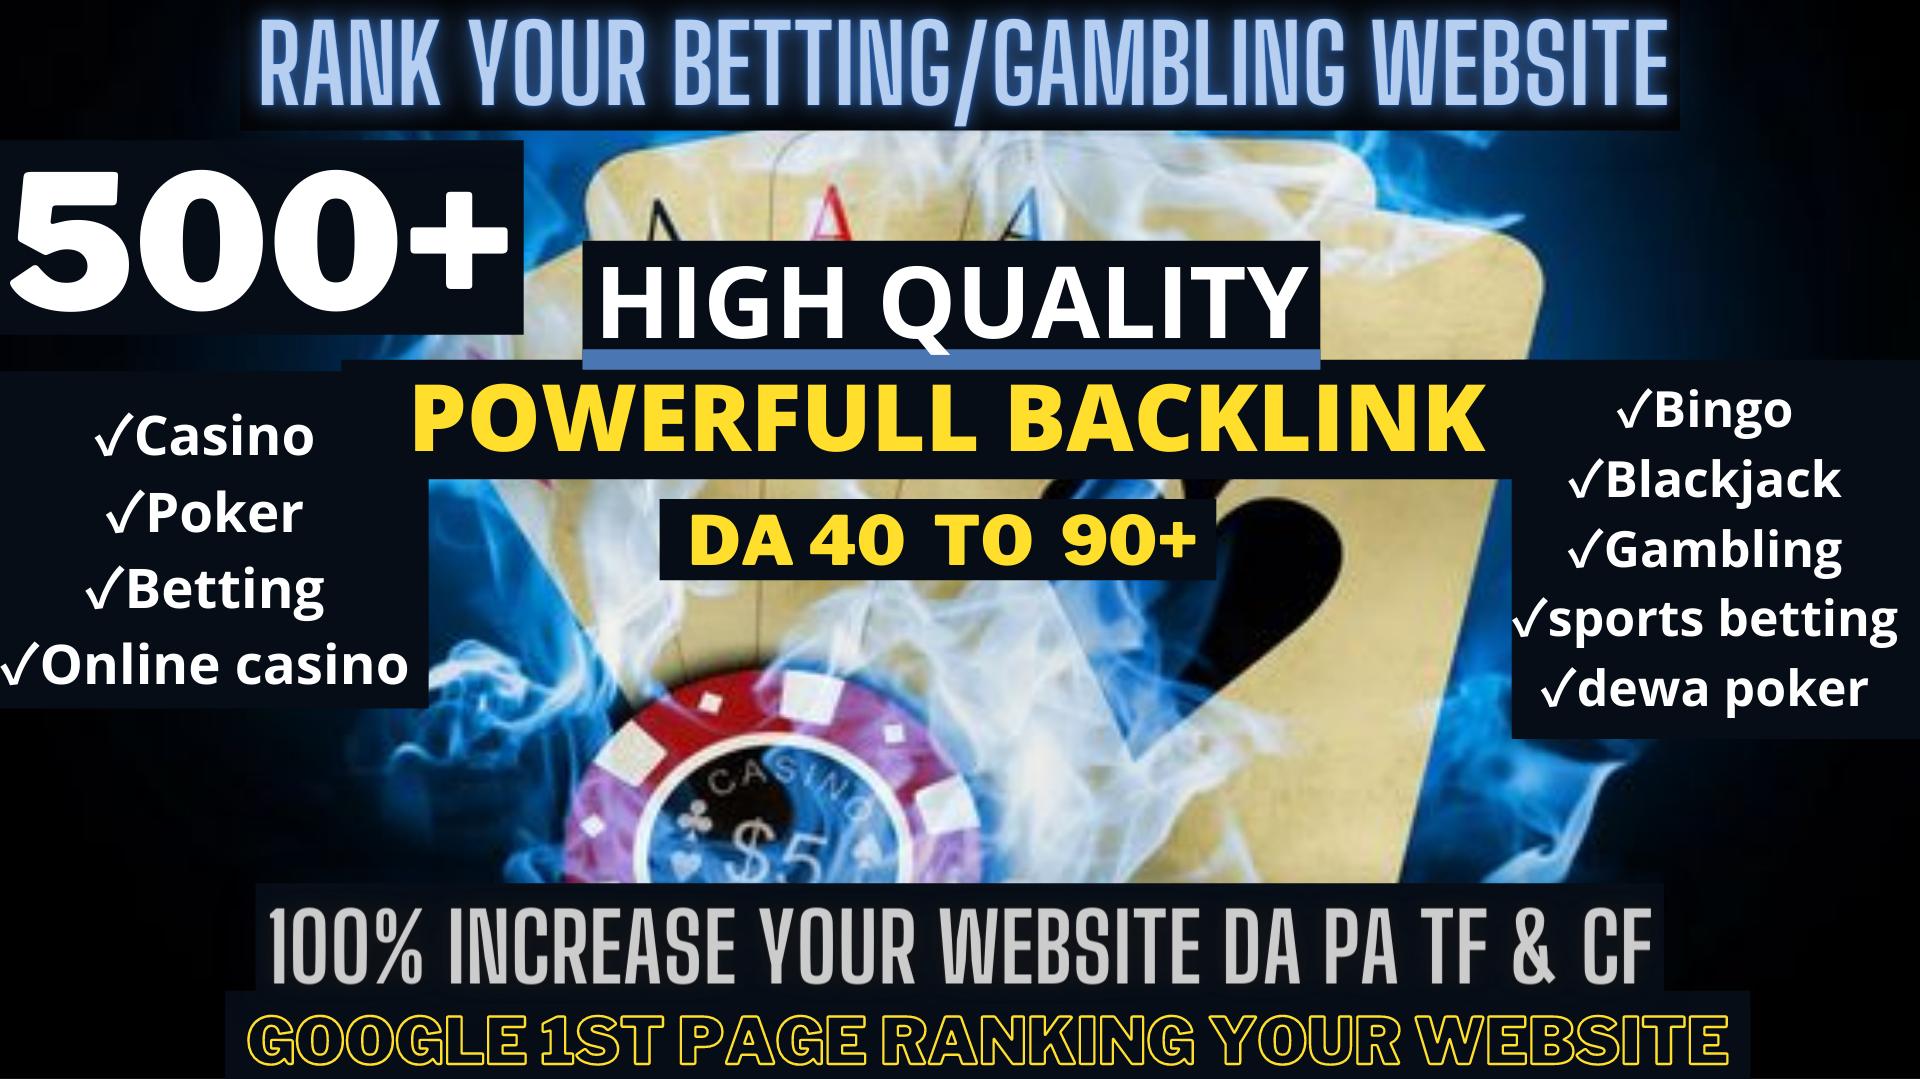 500+Parmanent CASINO/POKER/Gambling/Sports Betting/judi bola related web2.0 unique site